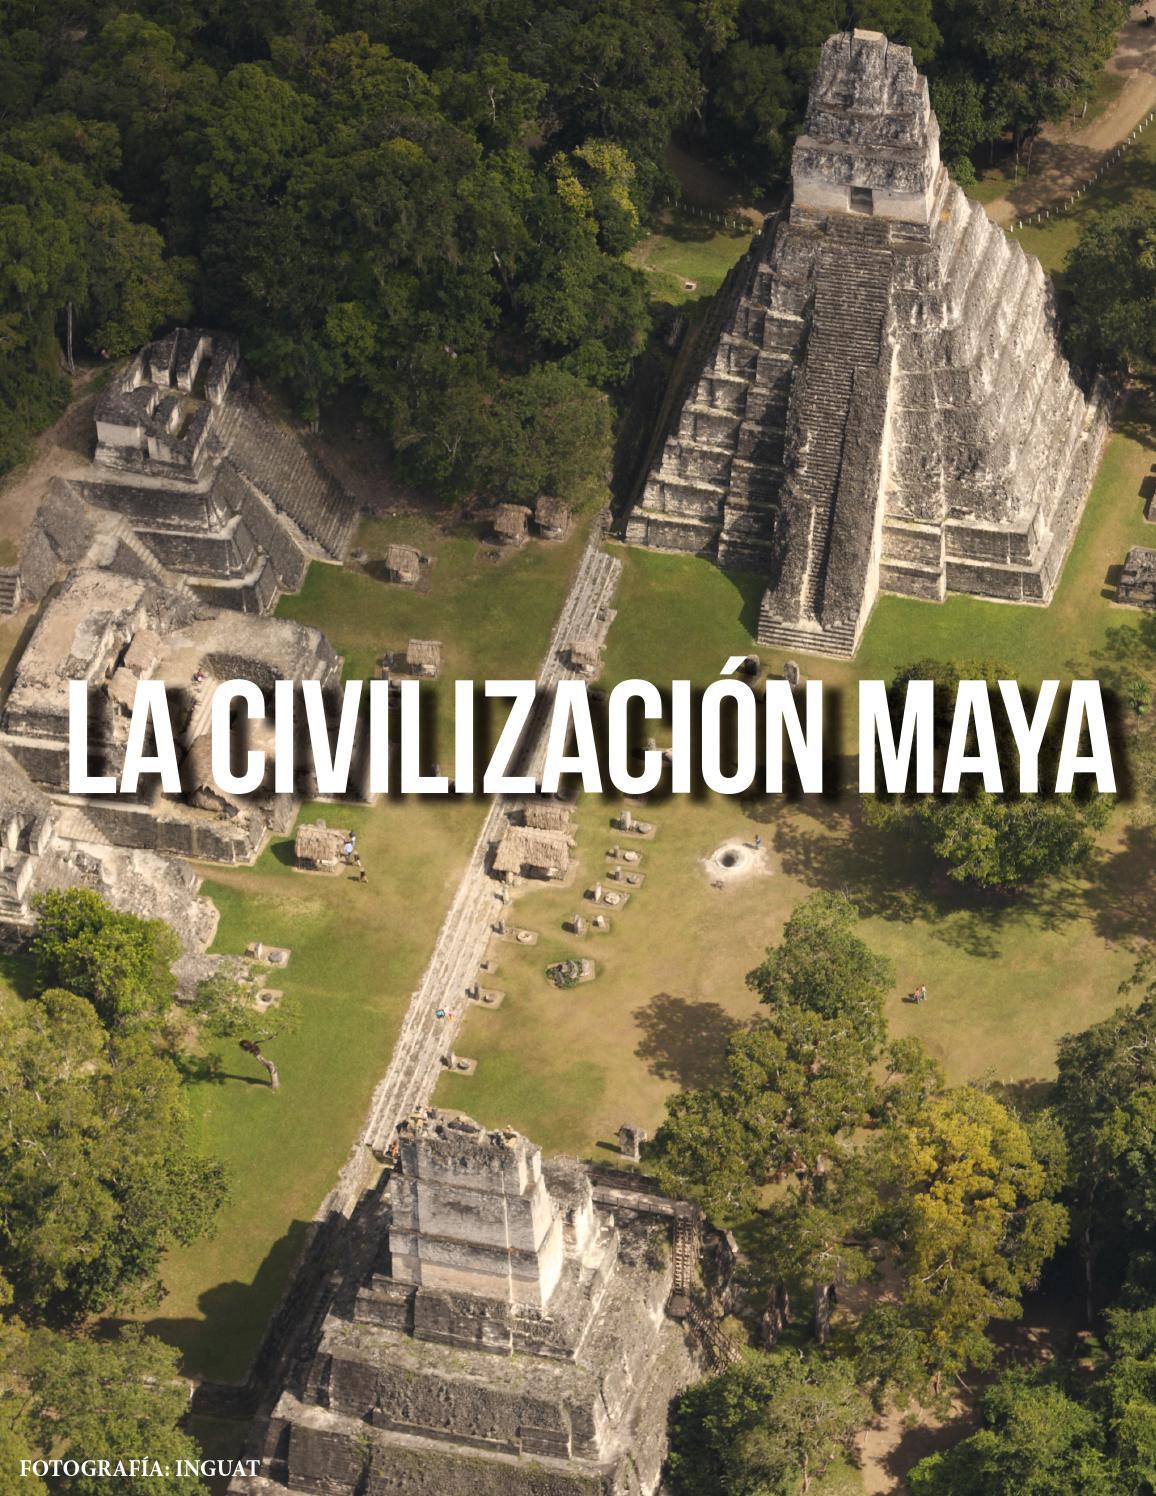 revista civilizacion maya by alexander cividanis issuu issuu logo eps issuu logo png